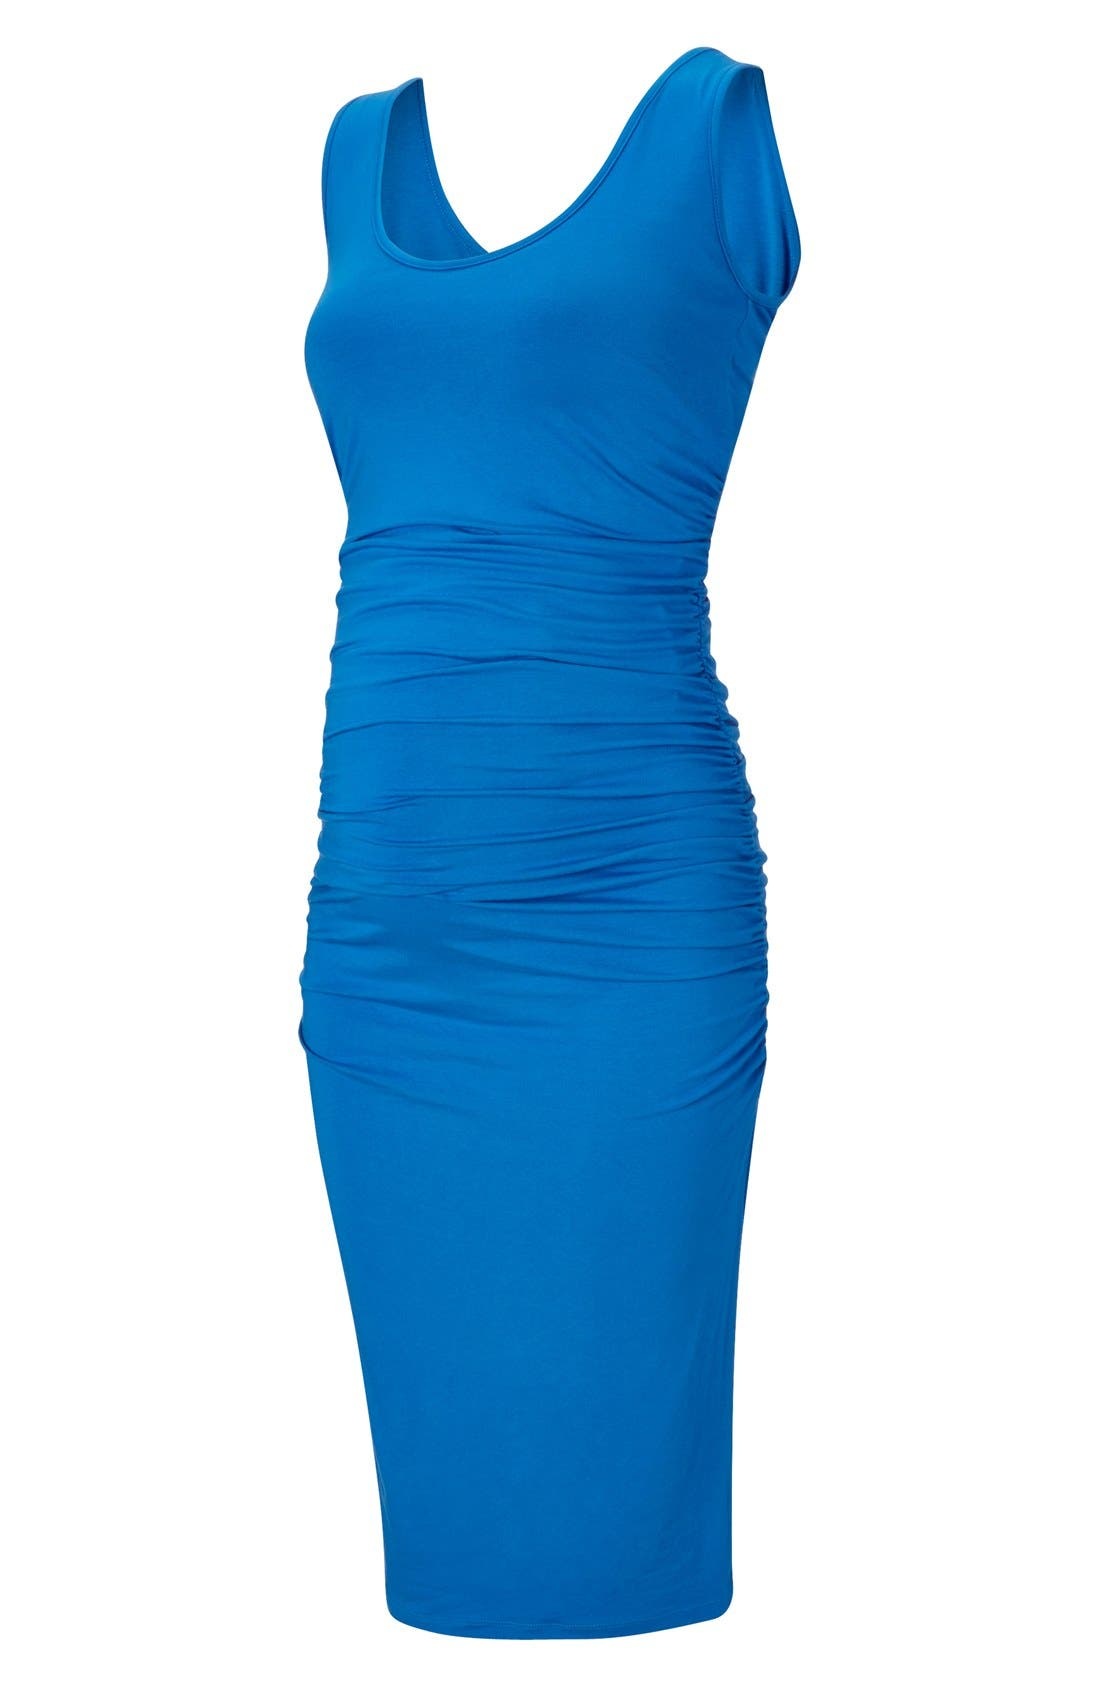 ISABELLA OLIVER,                             'Ellis' Maternity Tank Dress,                             Alternate thumbnail 3, color,                             PEACOCK BLUE